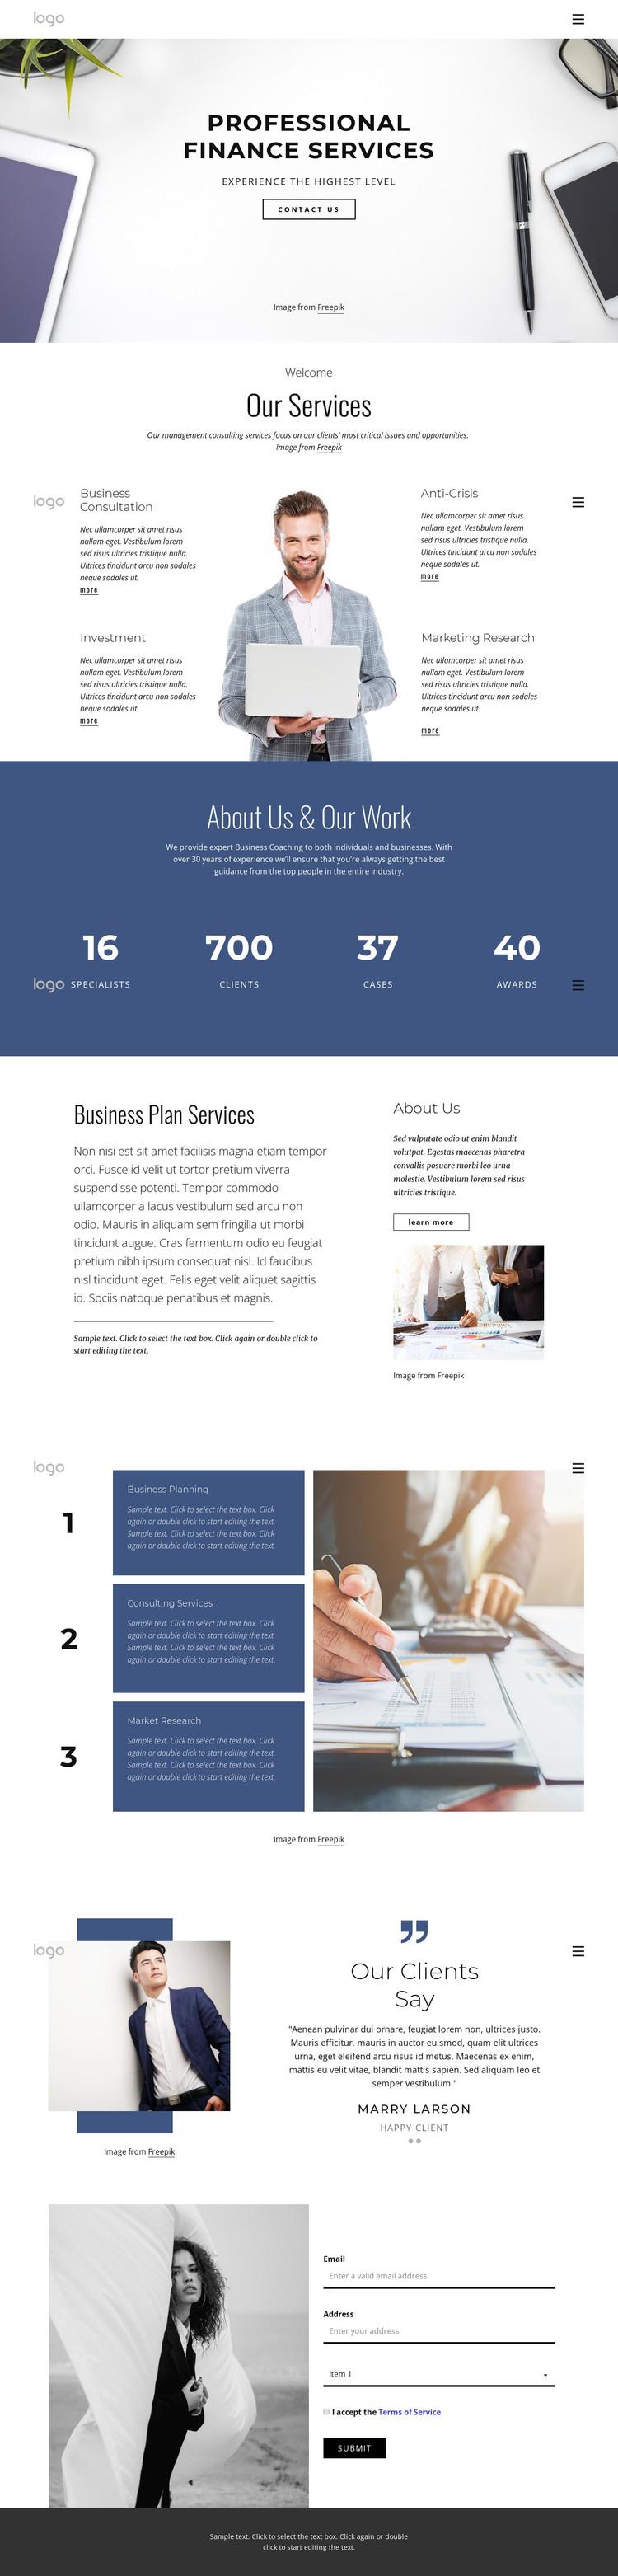 Professional finance services Web Design